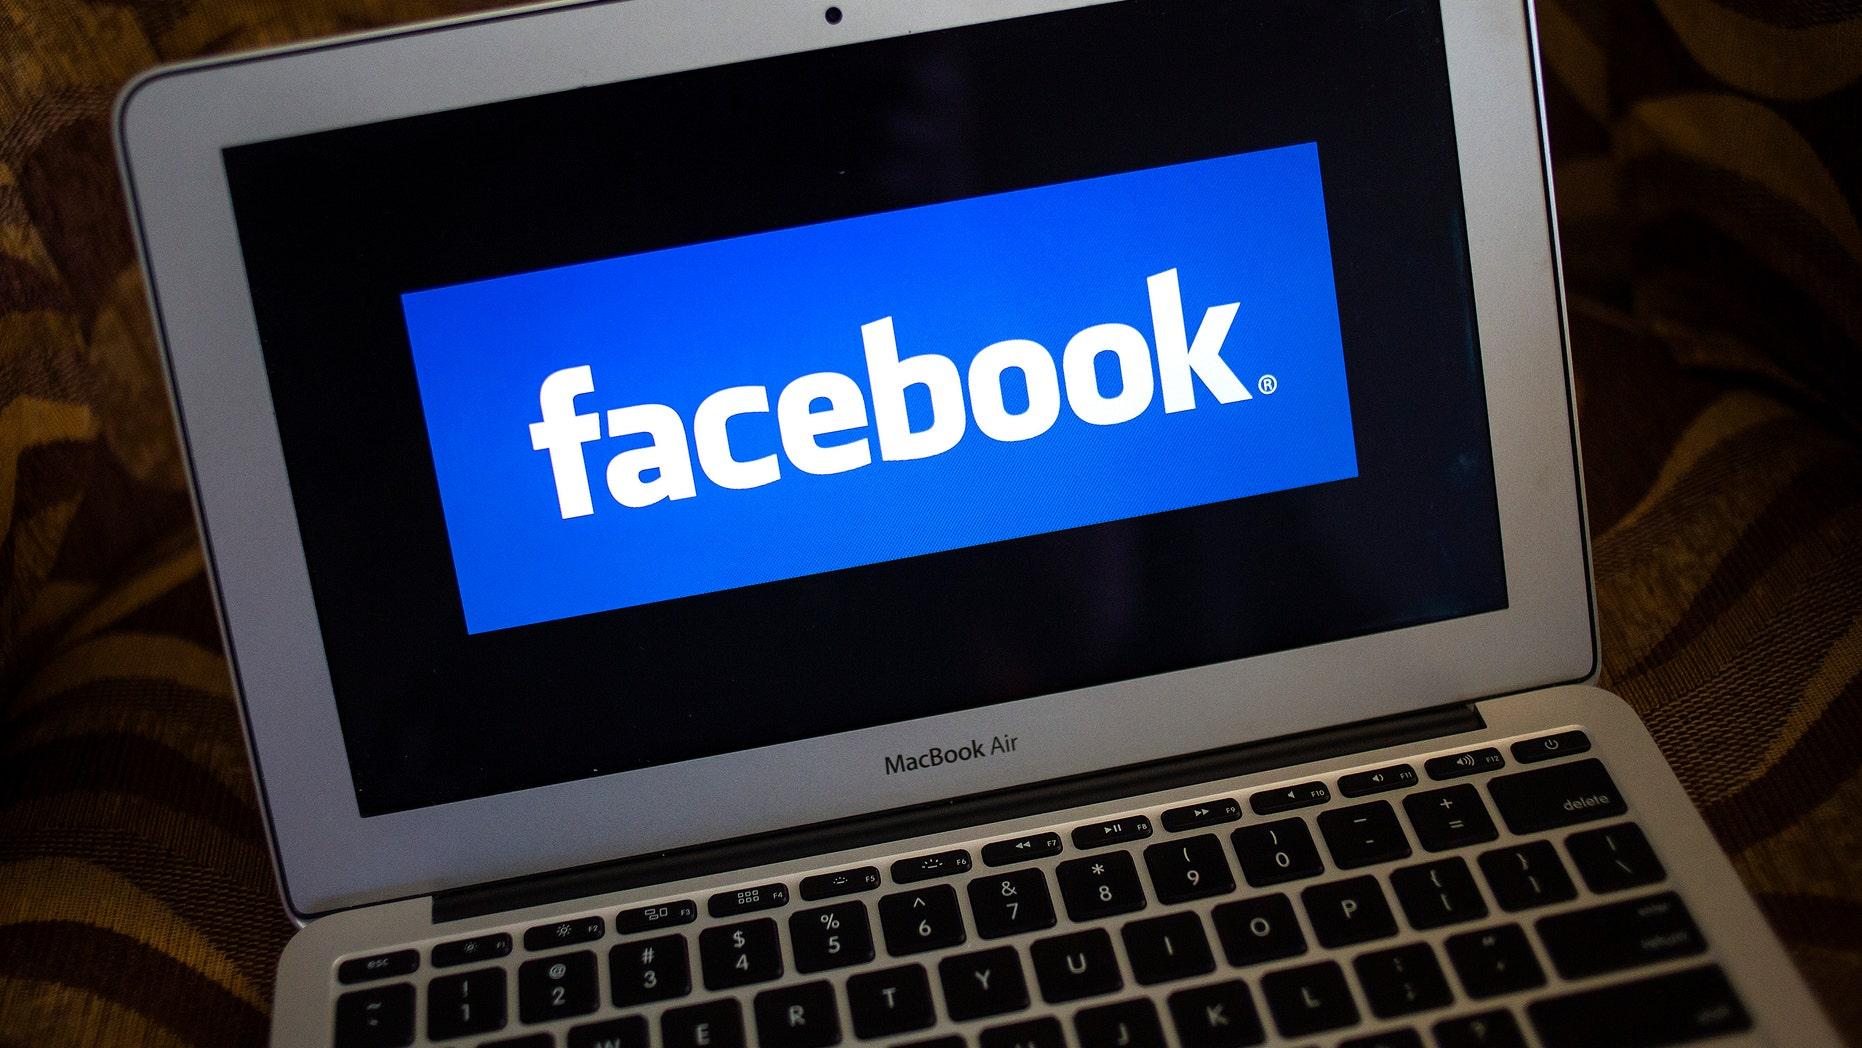 A portrait of the Facebook logo.